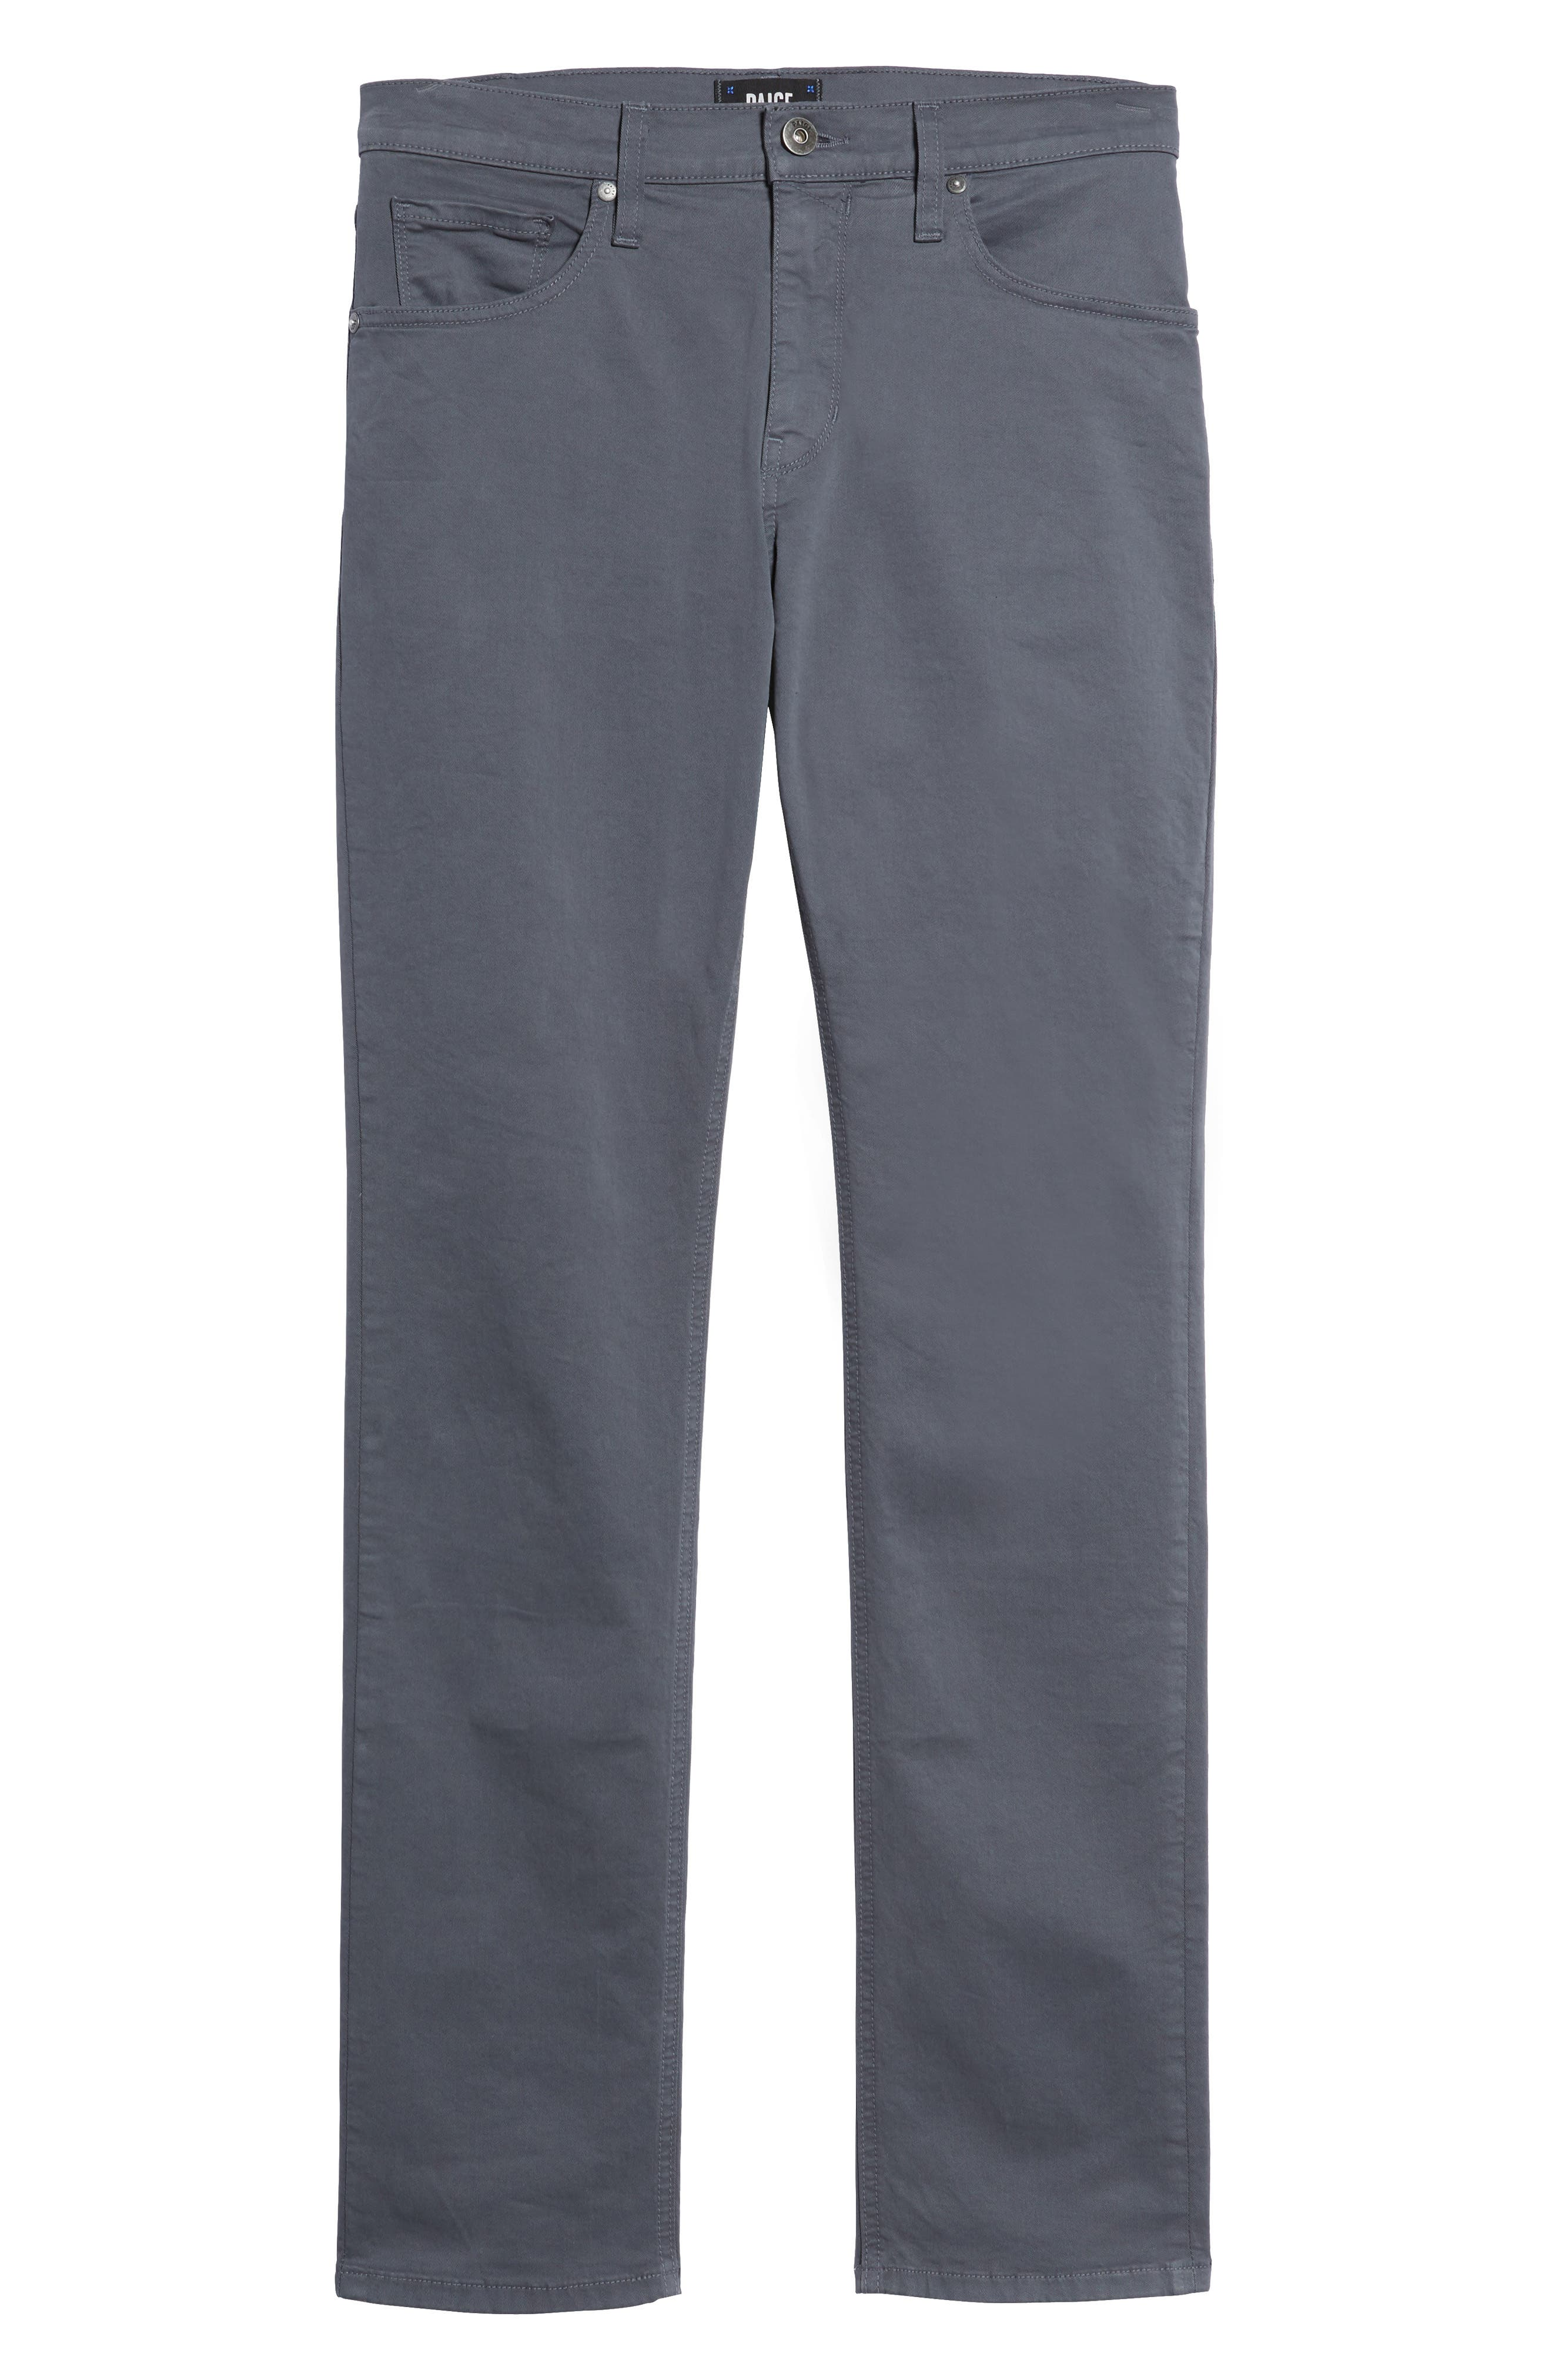 Federal Slim Straight Leg Twill Pants,                             Alternate thumbnail 6, color,                             MOON SHADE